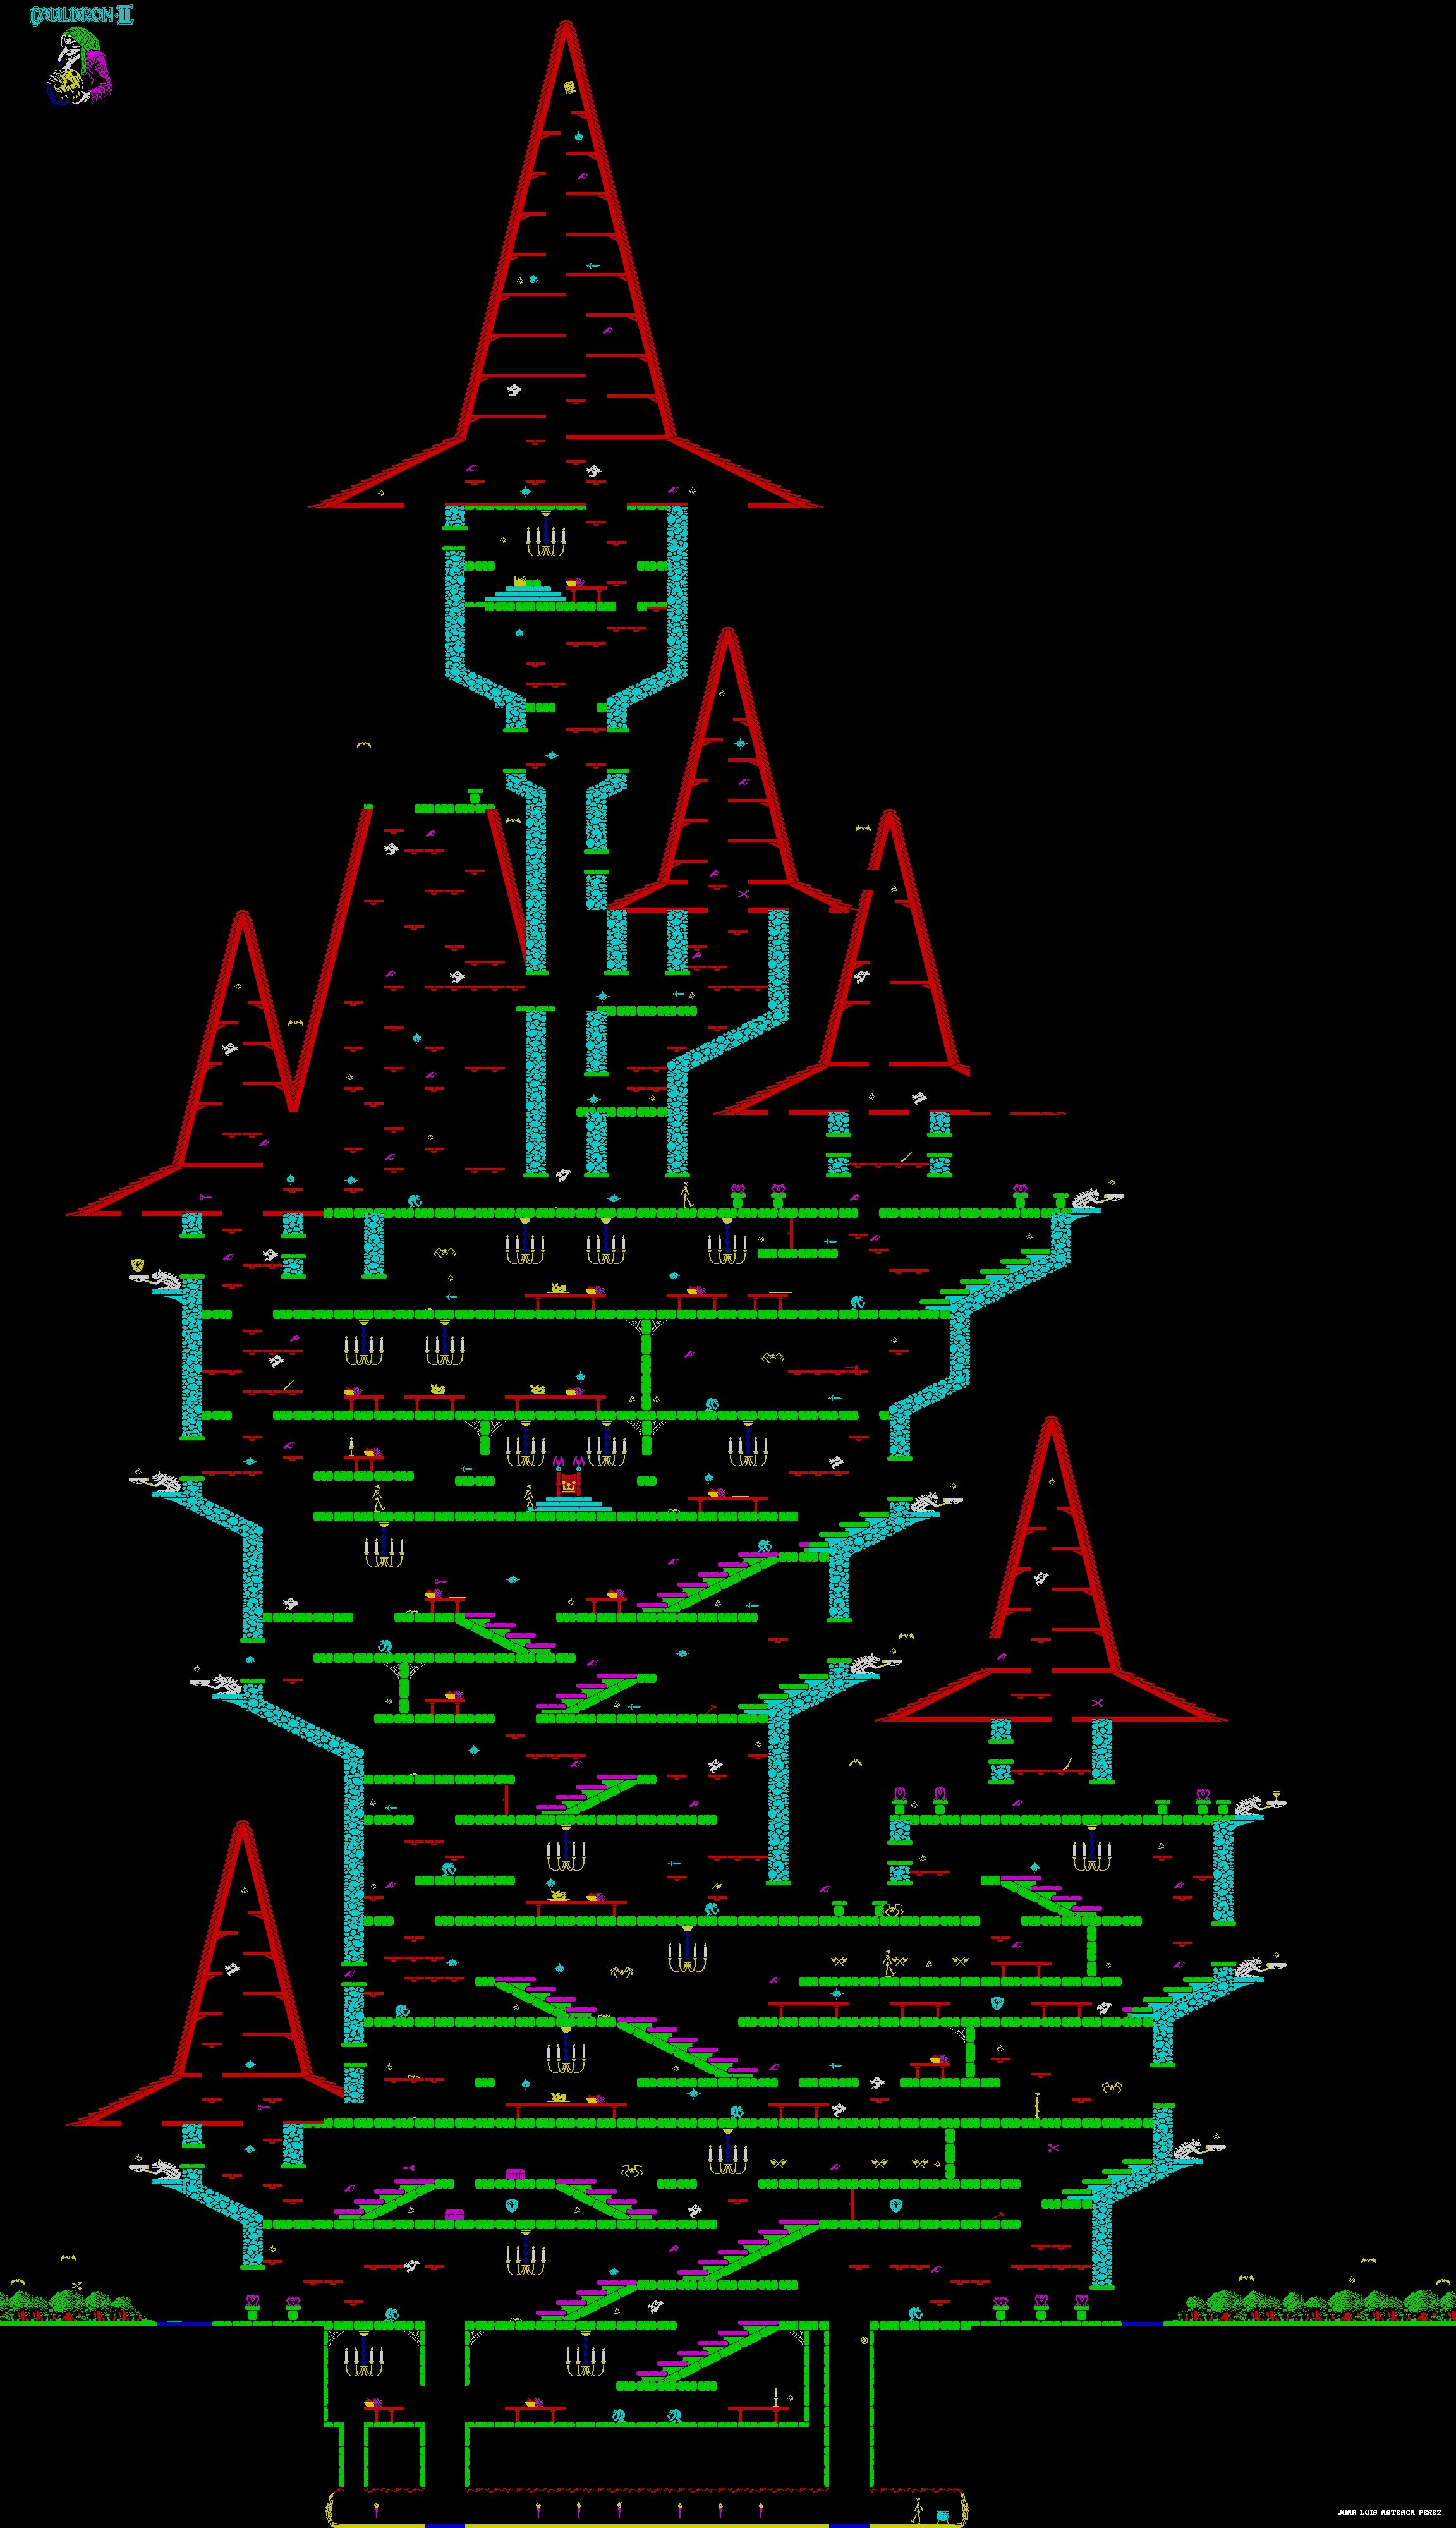 Cauldron 1985 - zx spectrum ссылки описание